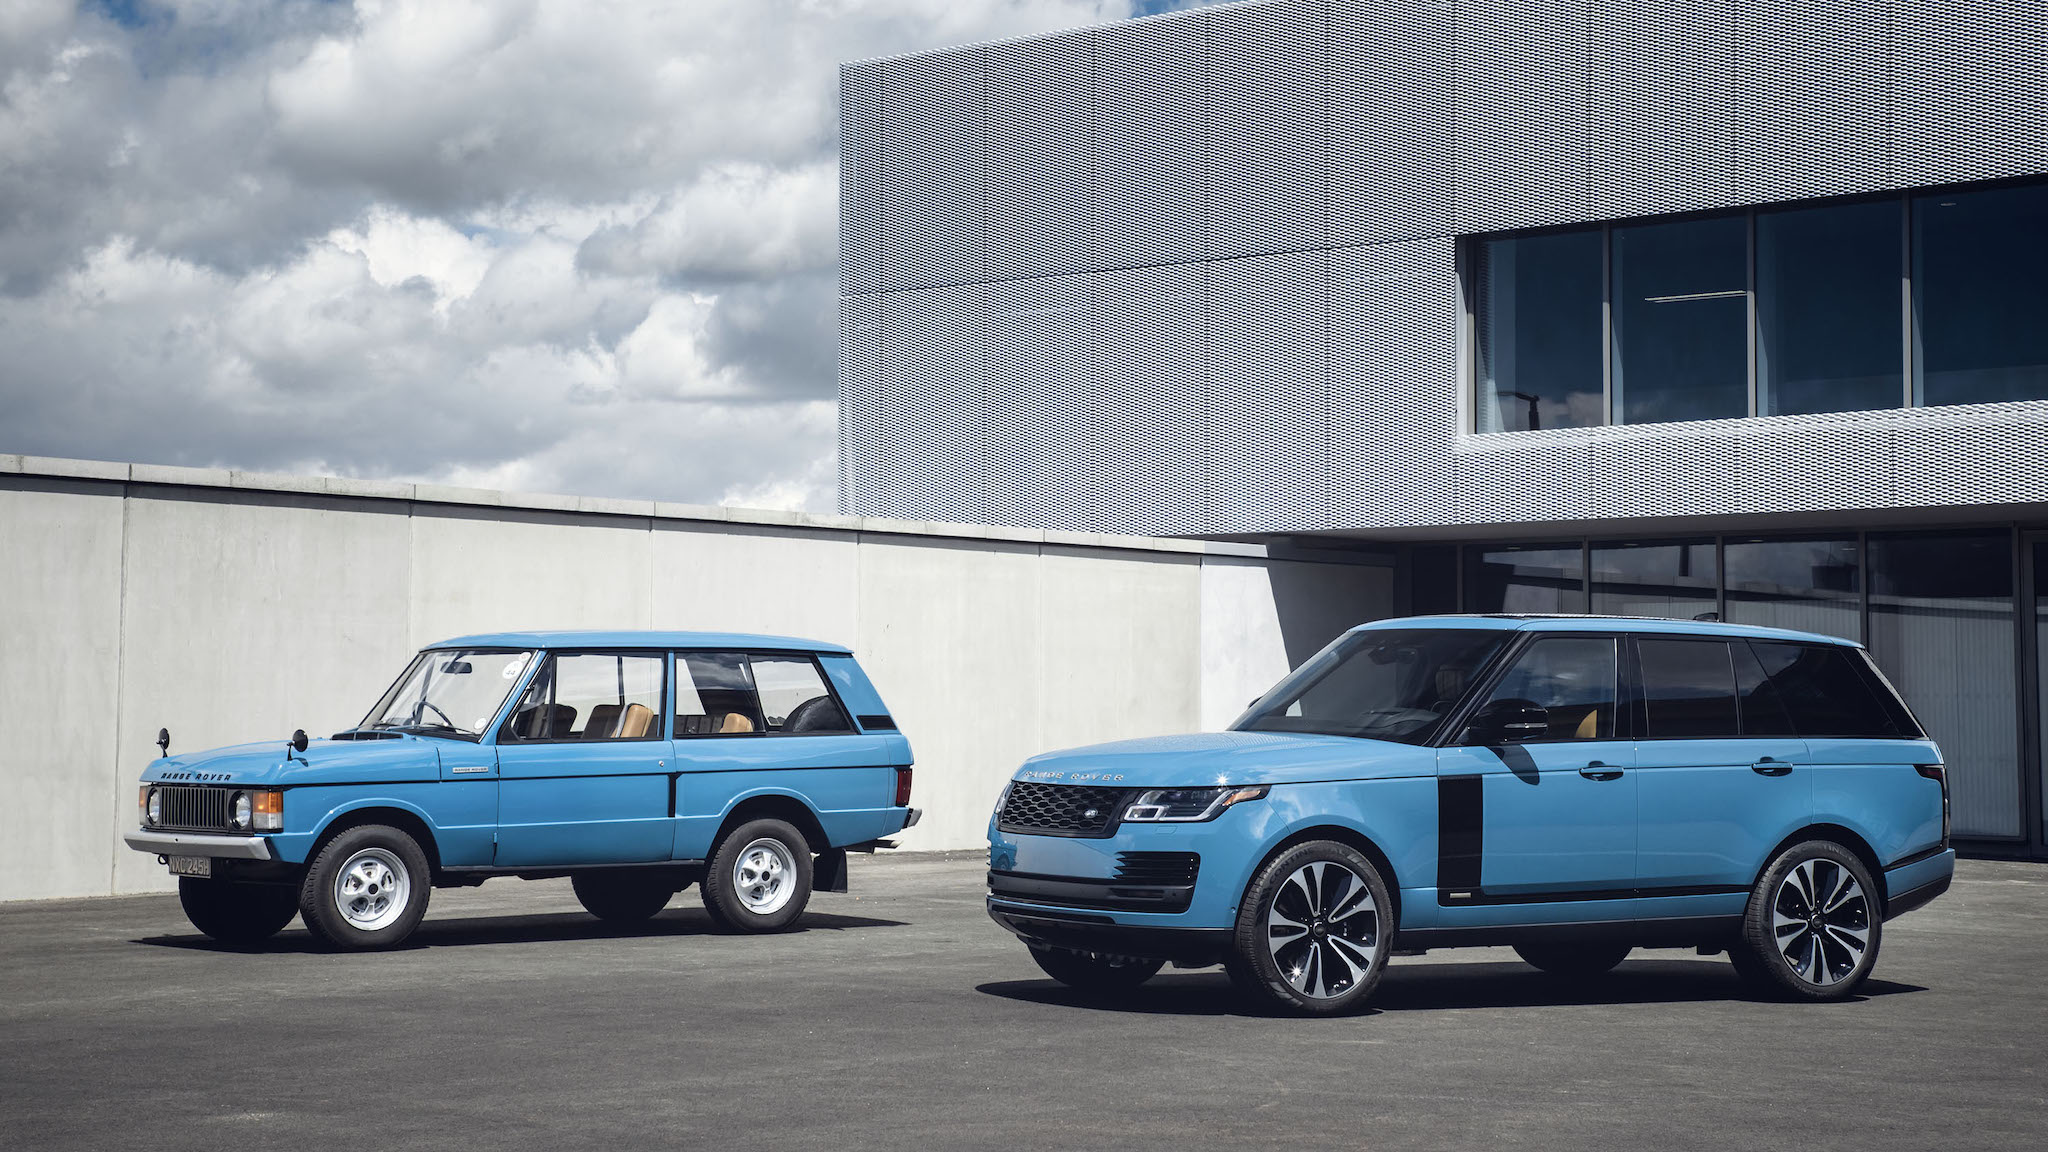 致敬問世 50 週年,Land Rover 發表 Range Rover Fifty 限量版